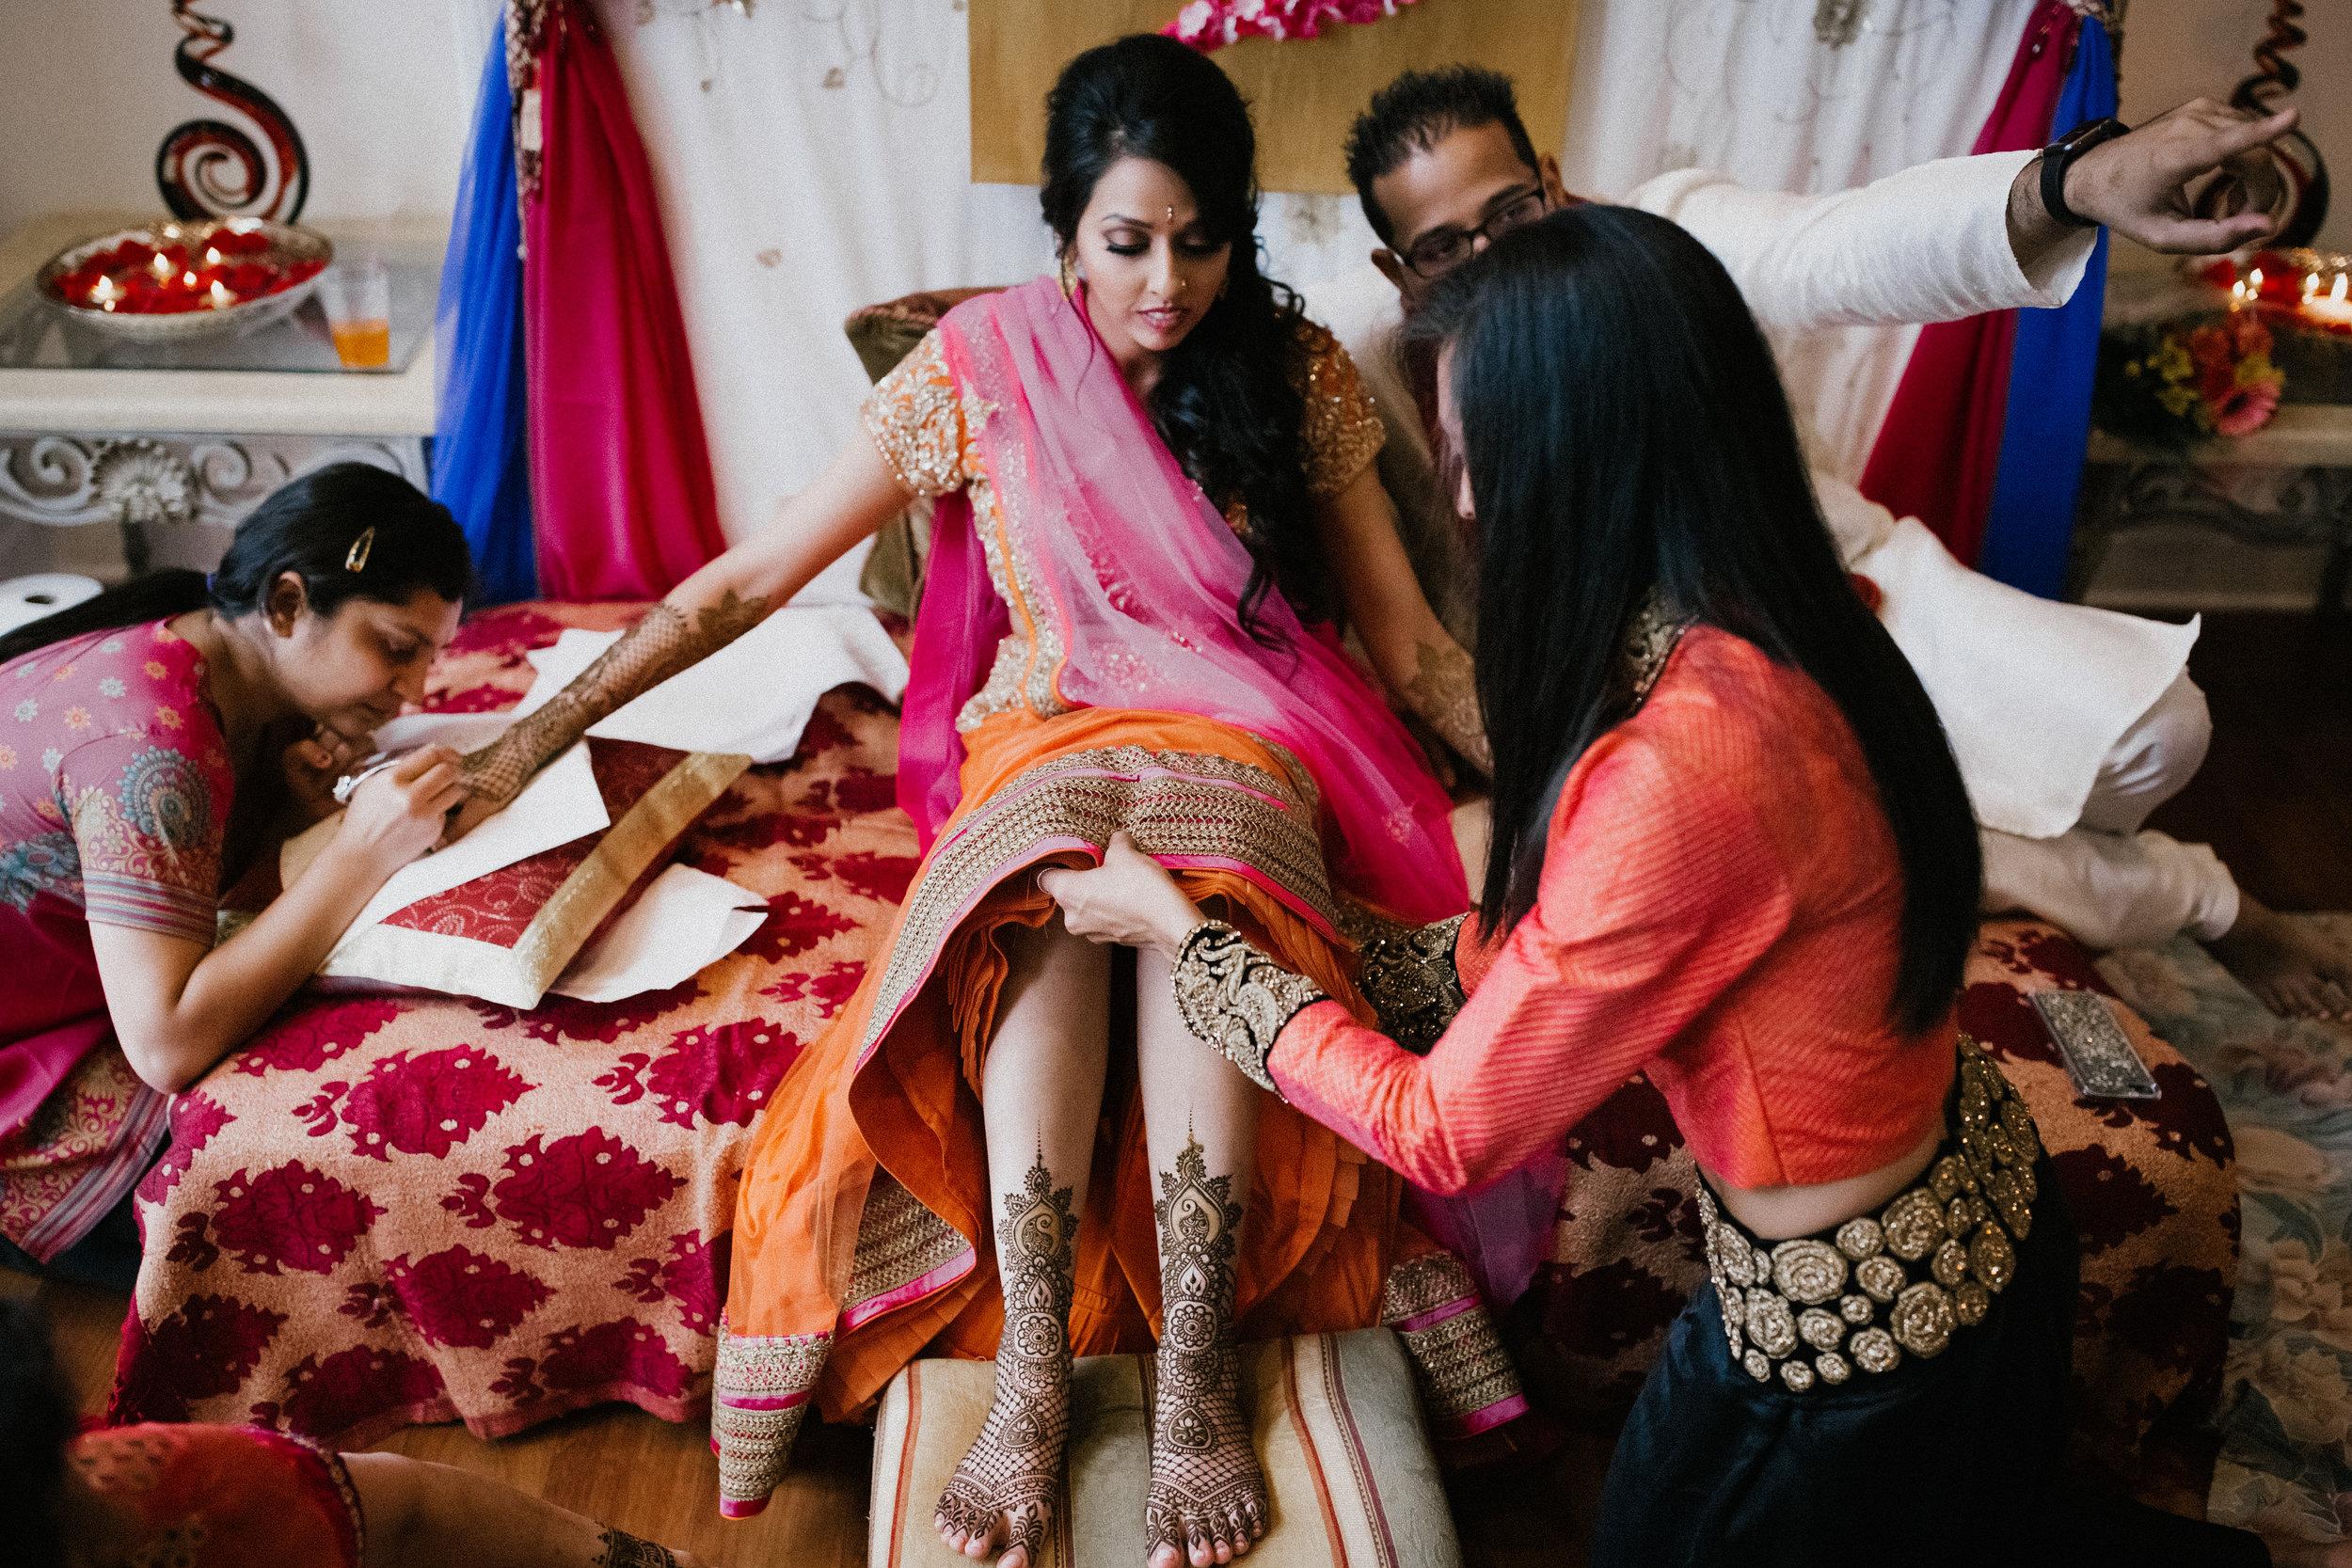 Aparna-Ankit-Patel-Mehndi-Wedding-Photos-0043.jpg